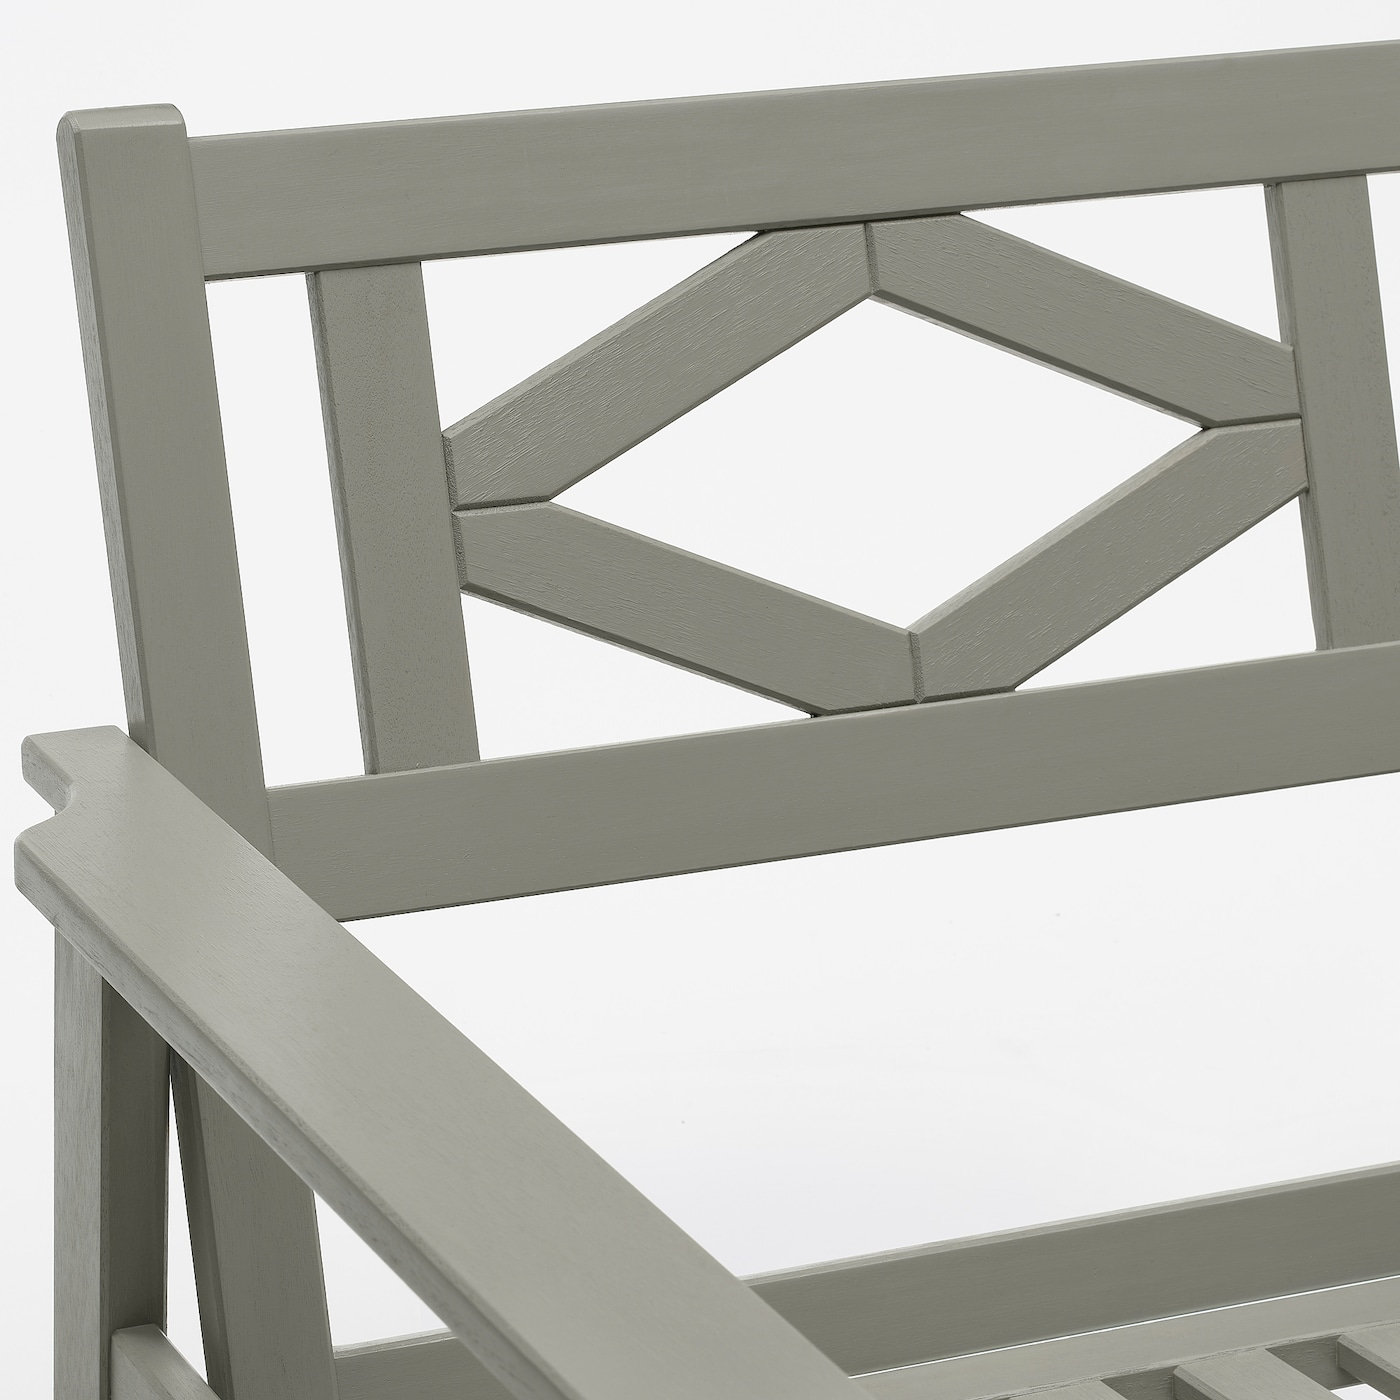 BONDHOLMEN Sessel/außen, grau